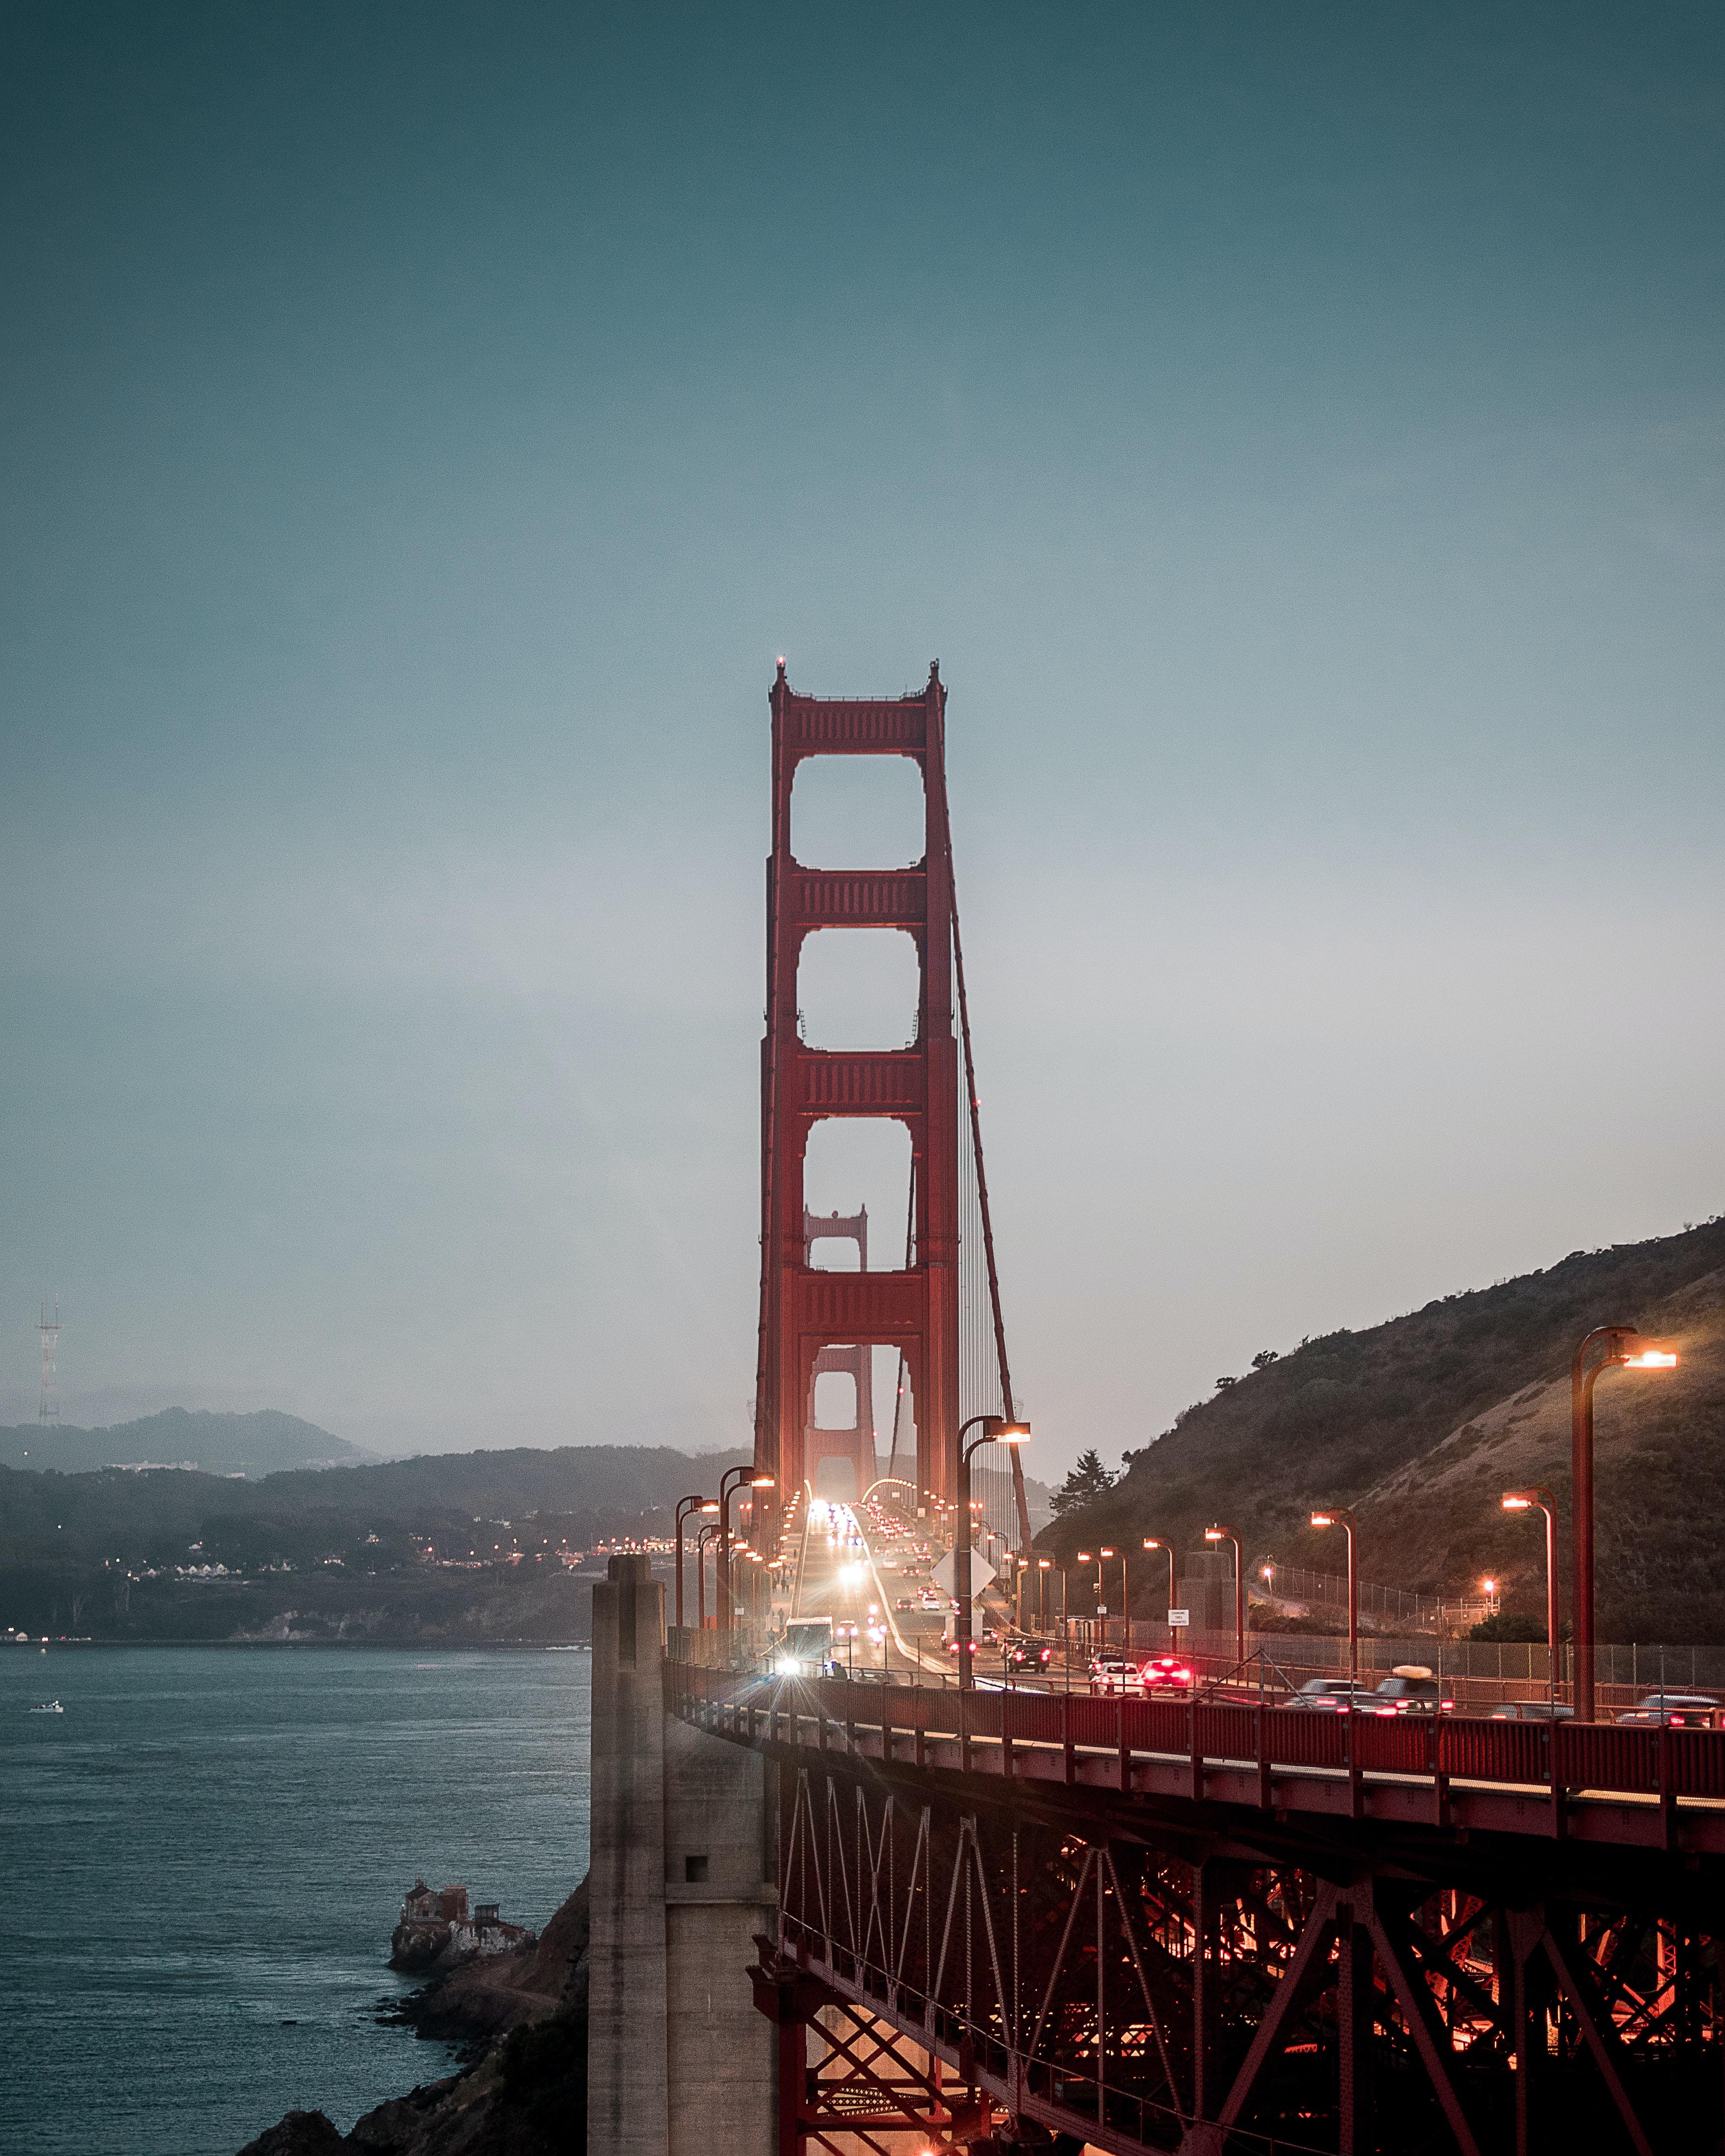 vehicles traveling on Golden Gate Bridge, San Francisco